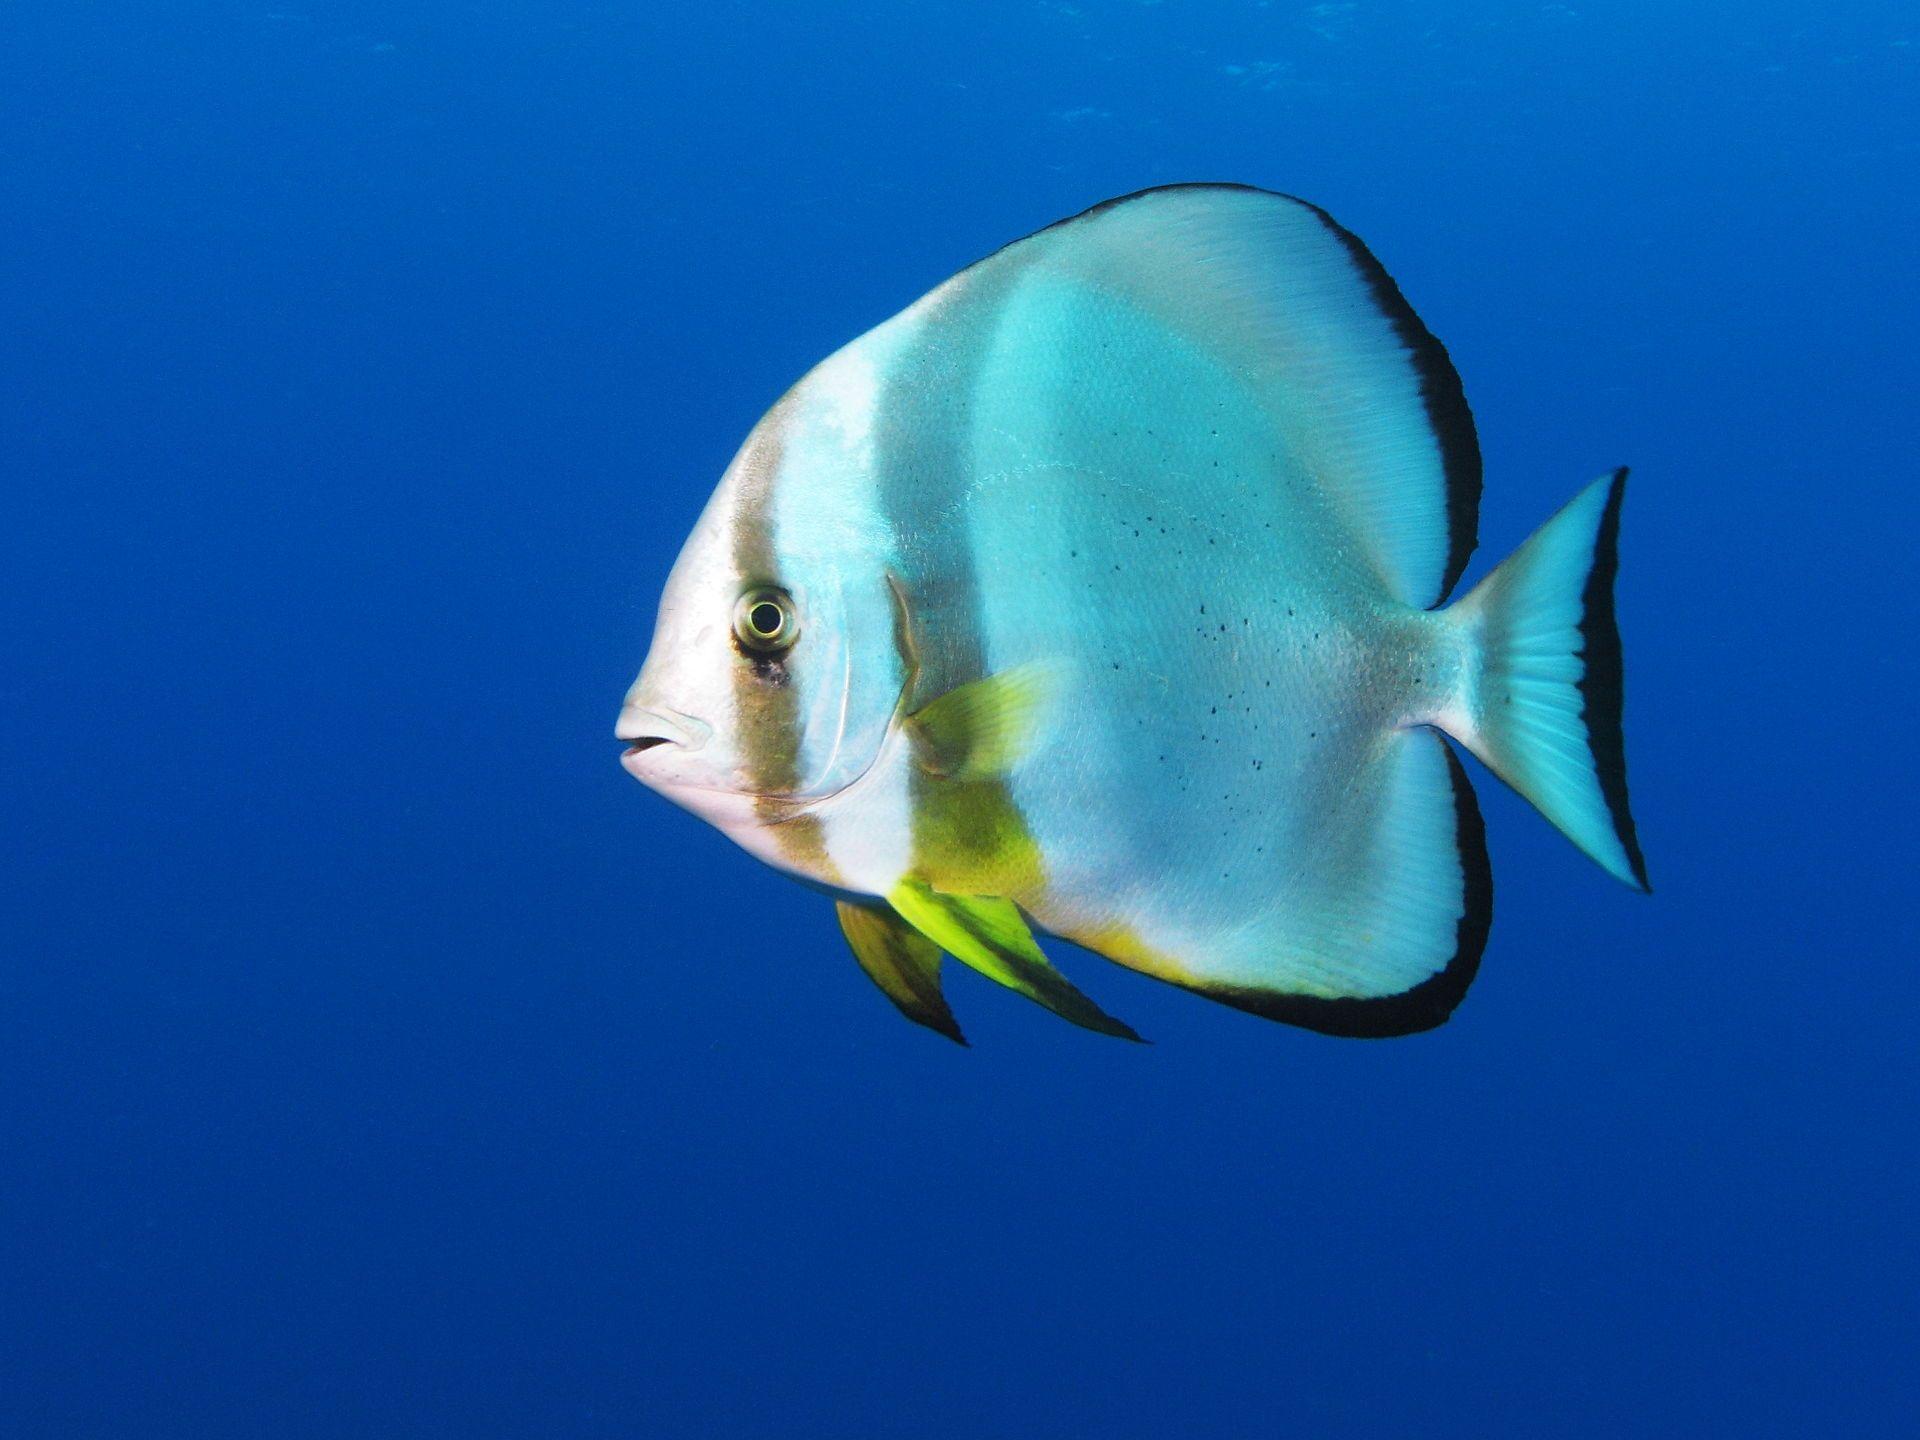 Orbicular batfish by Alexander Vasenin (license: Creative Commons 3.0)